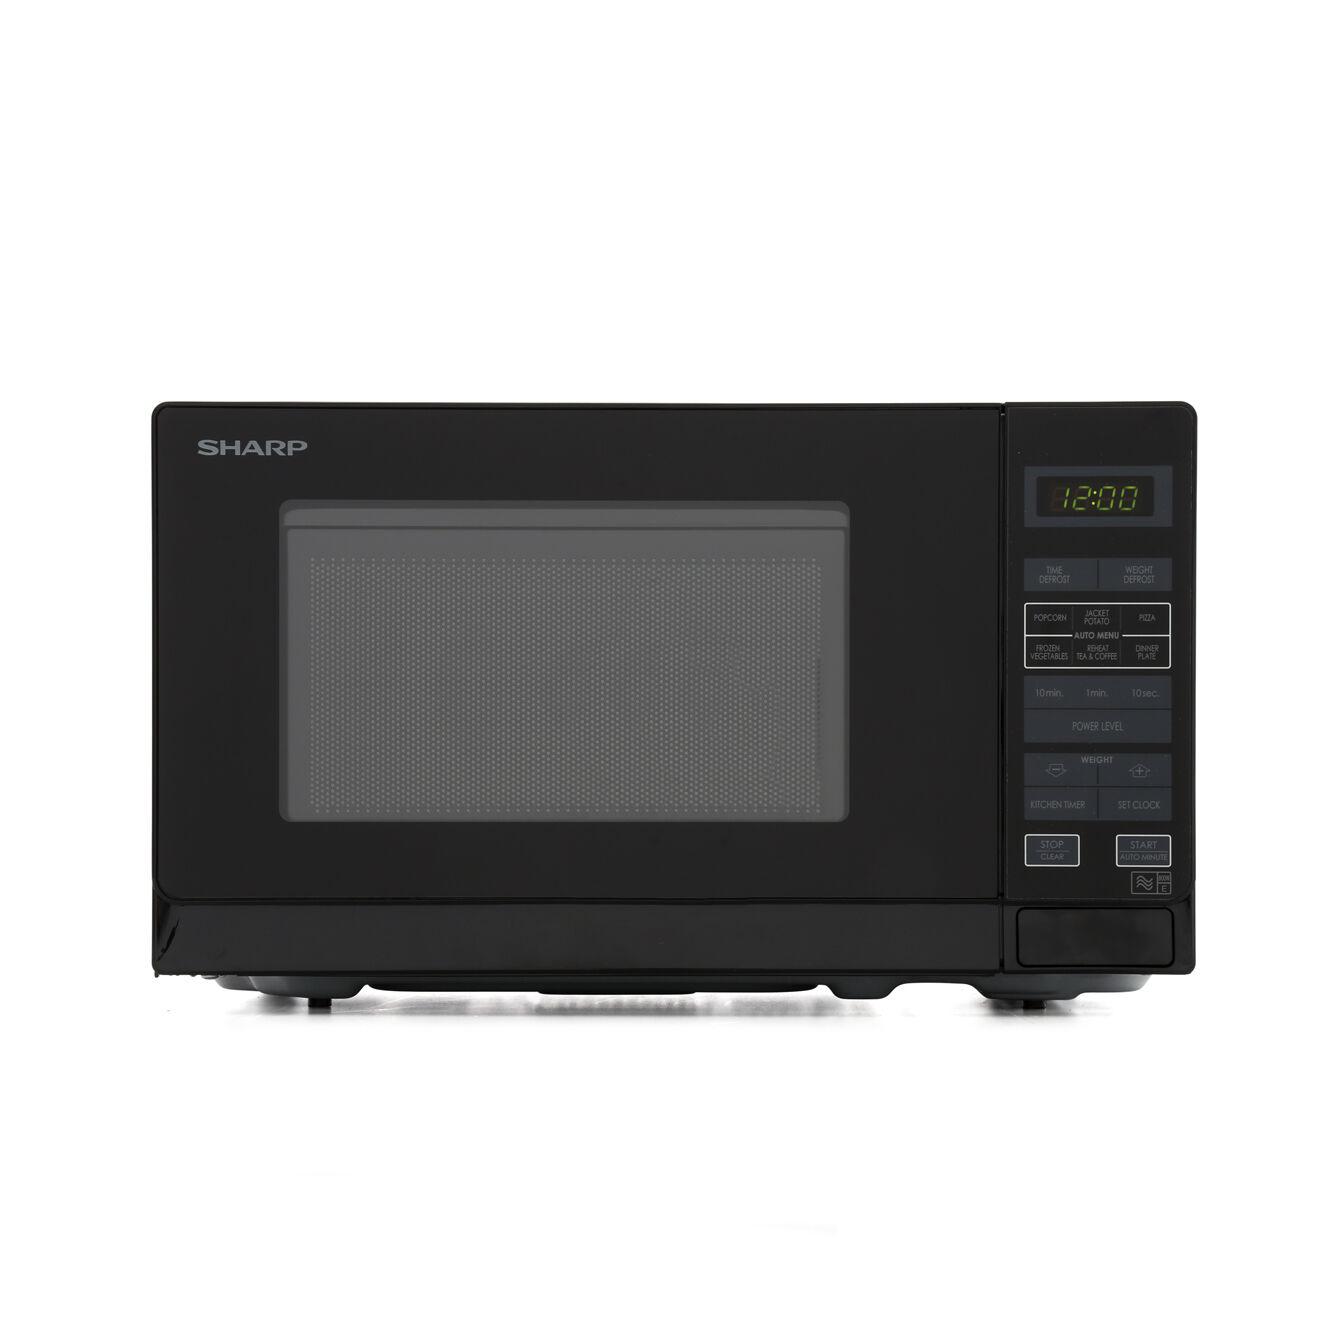 Sharp Microwave - Black - R272KM